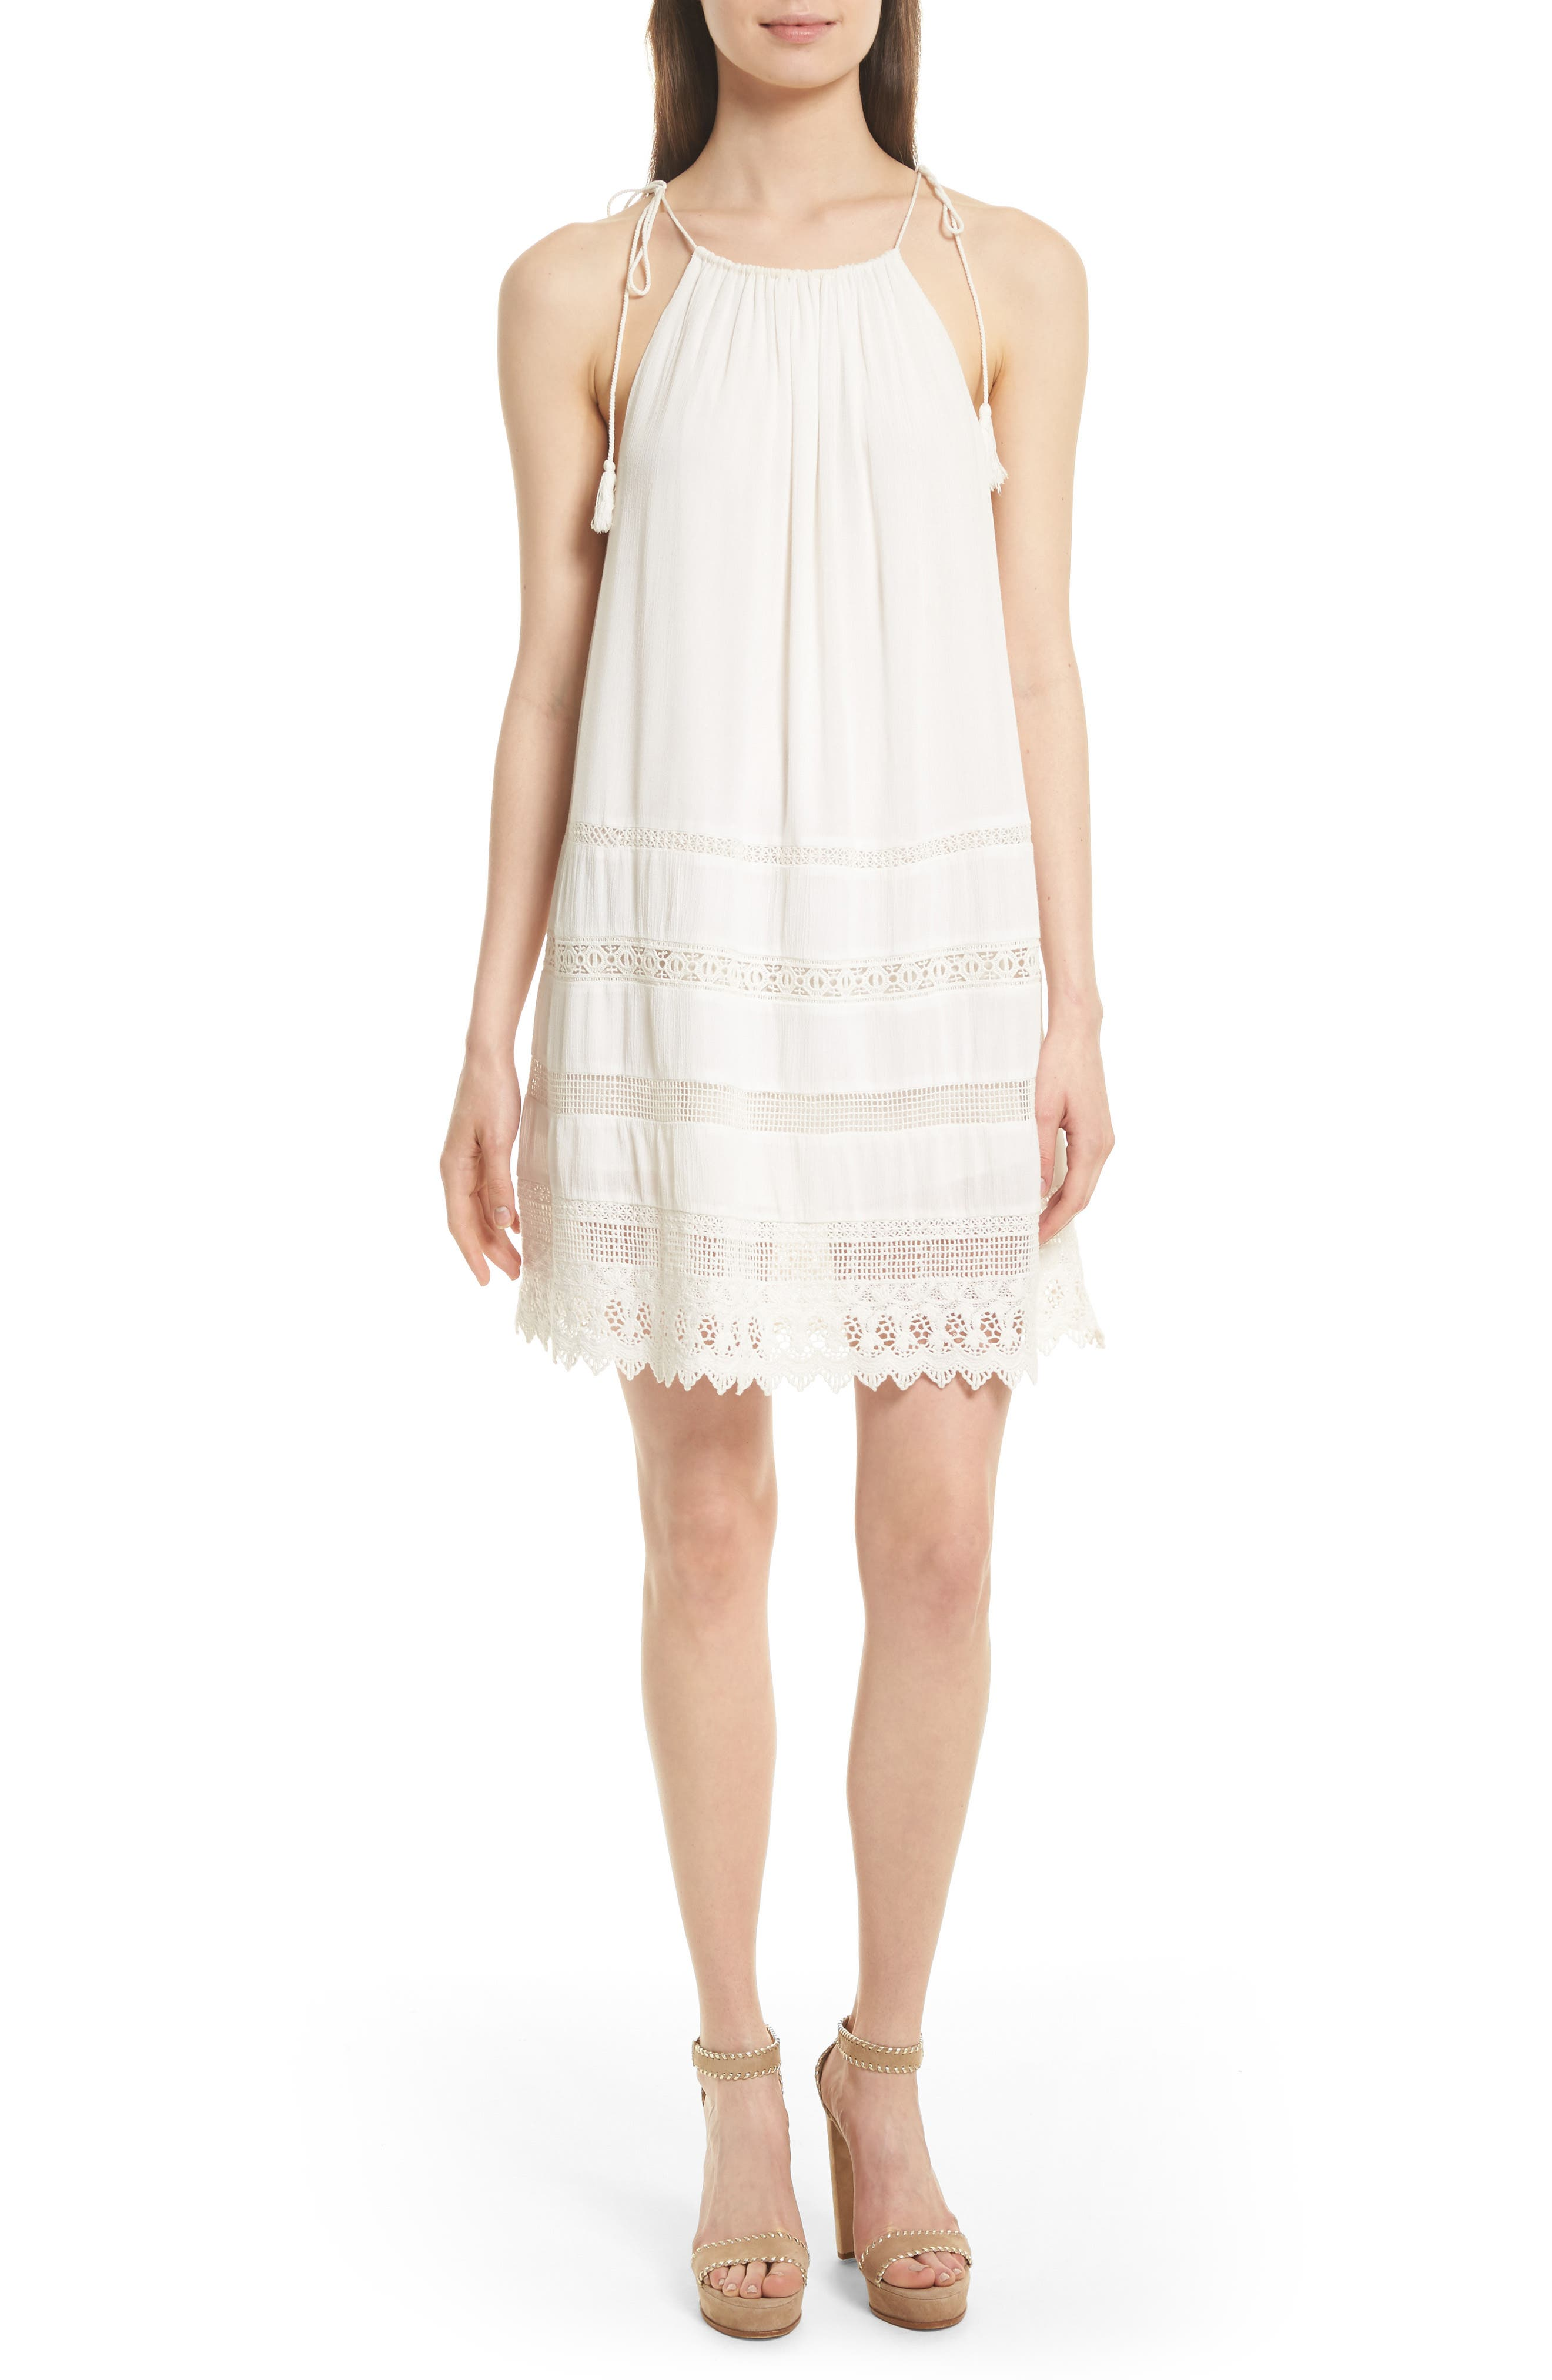 Alice + Olivia Danna Tie Strap A-Line Dress